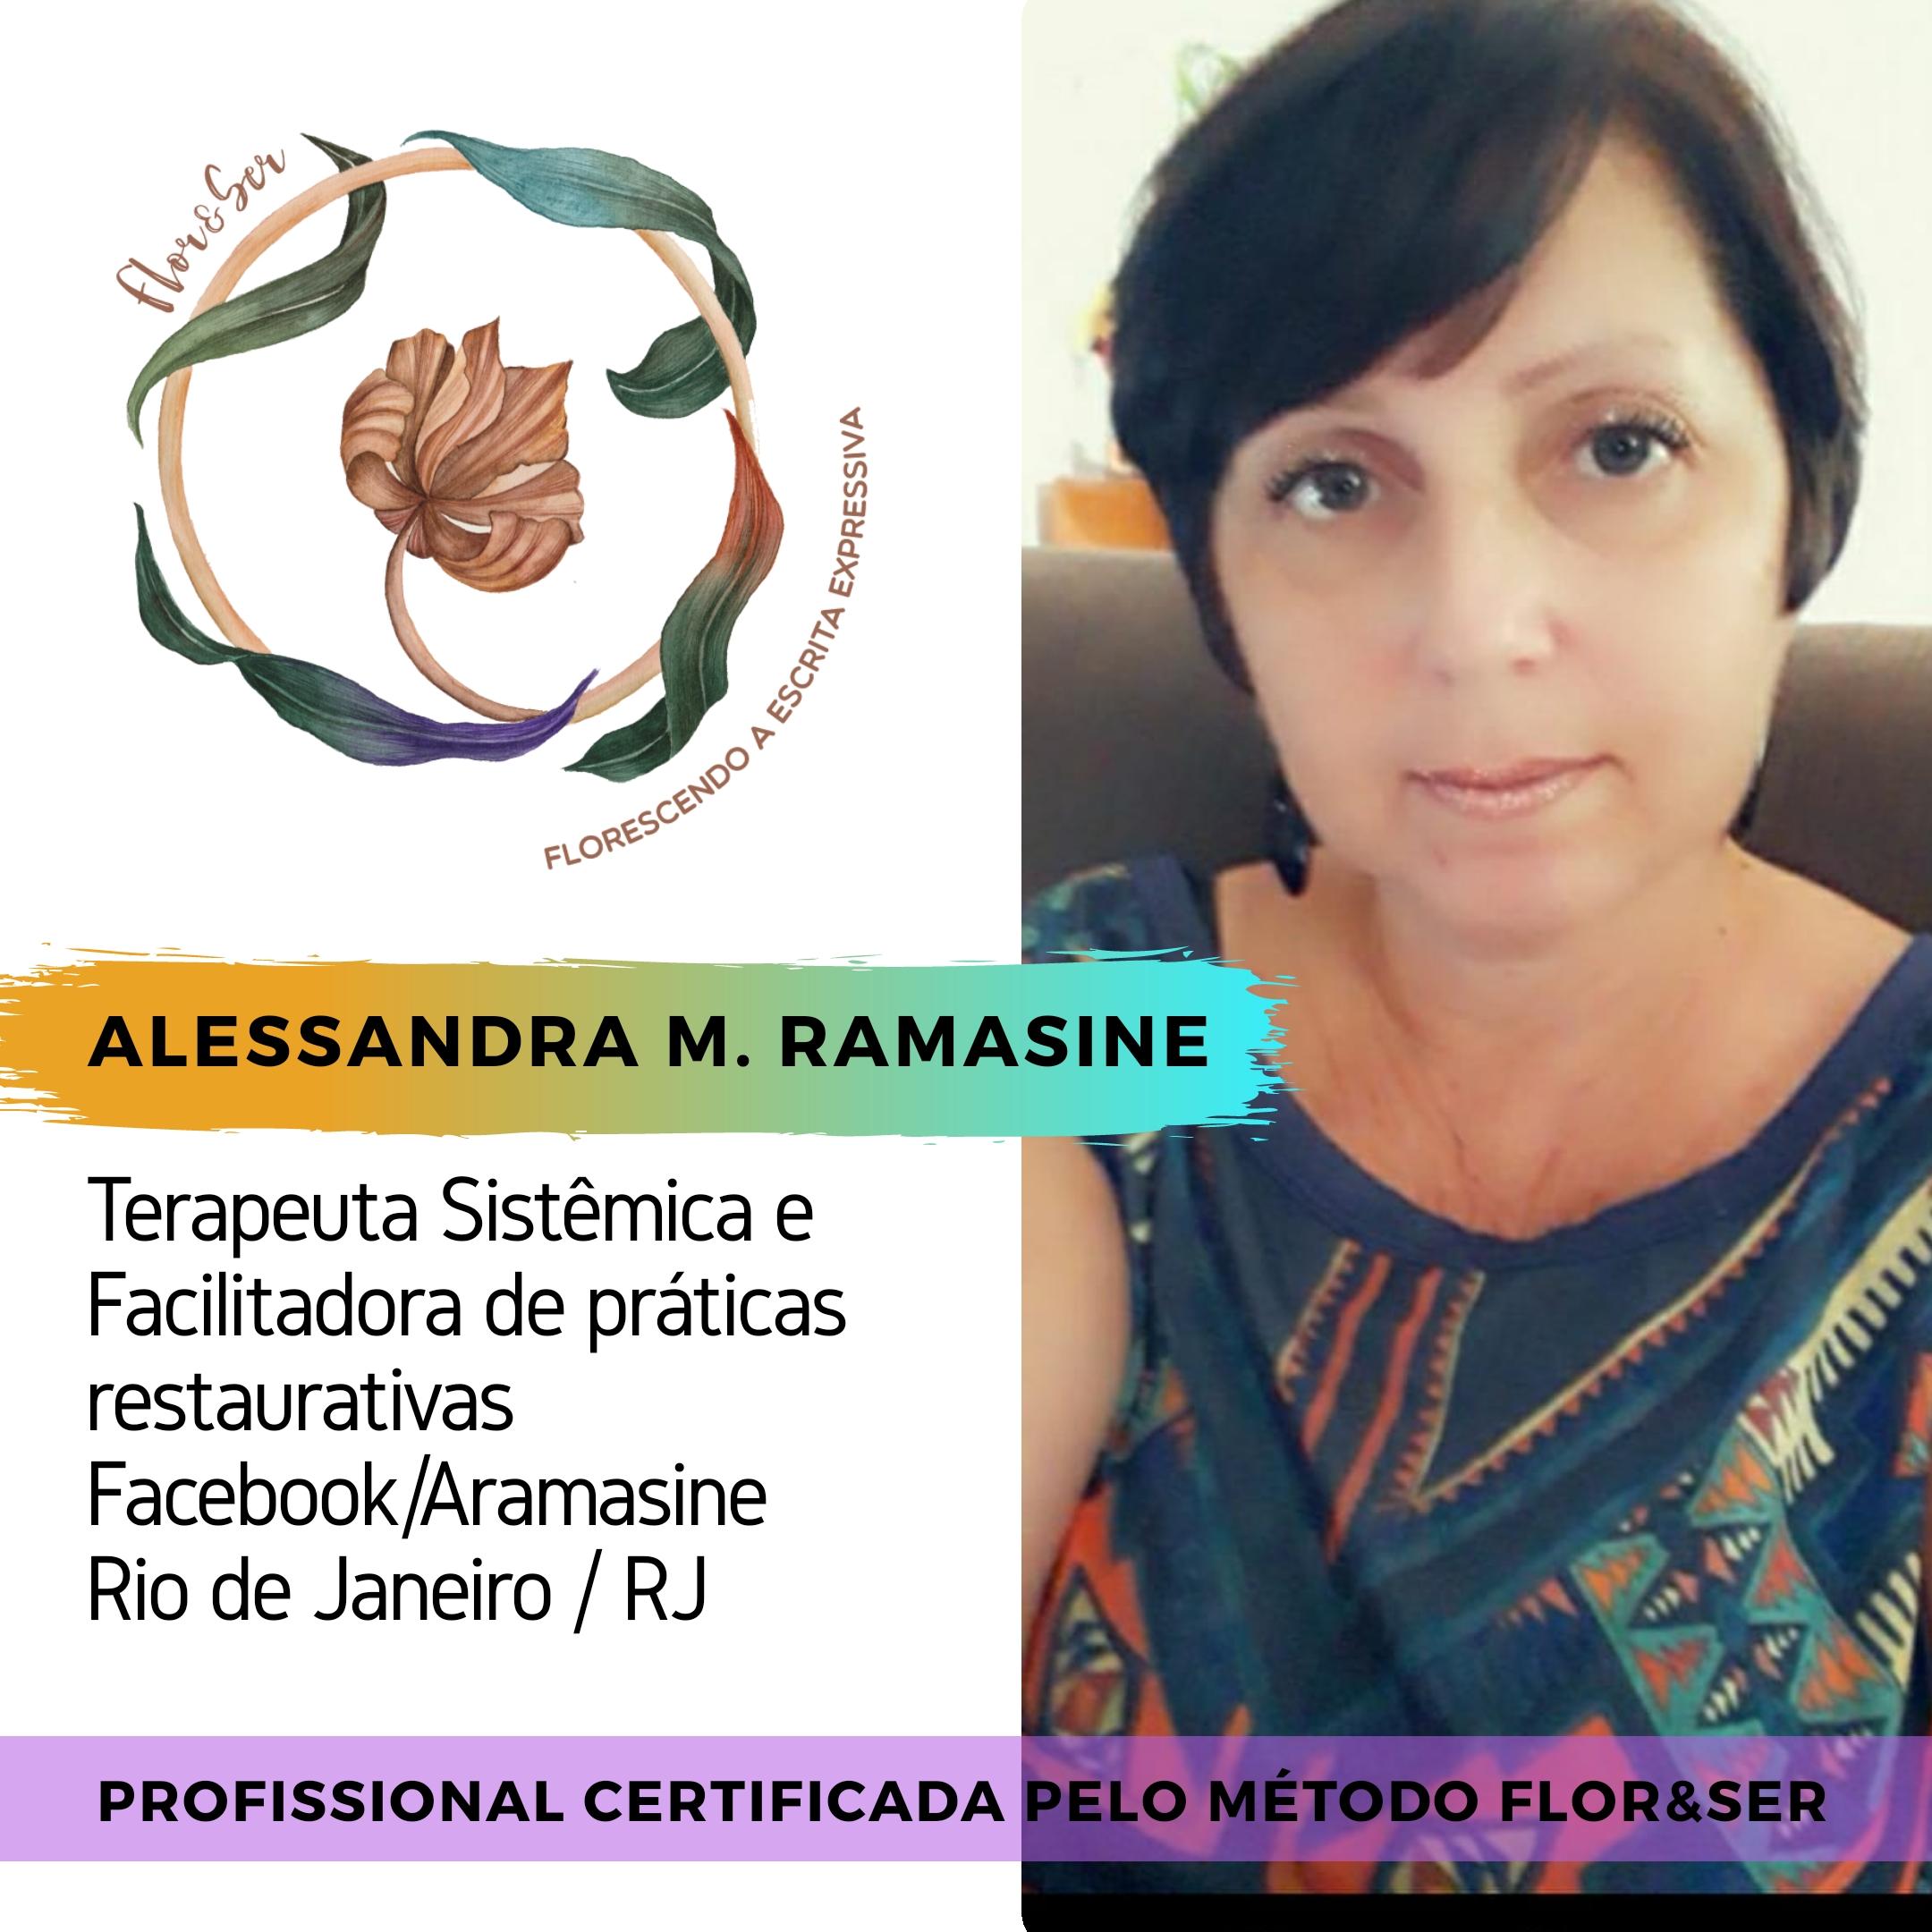 Alessandra Ramasine